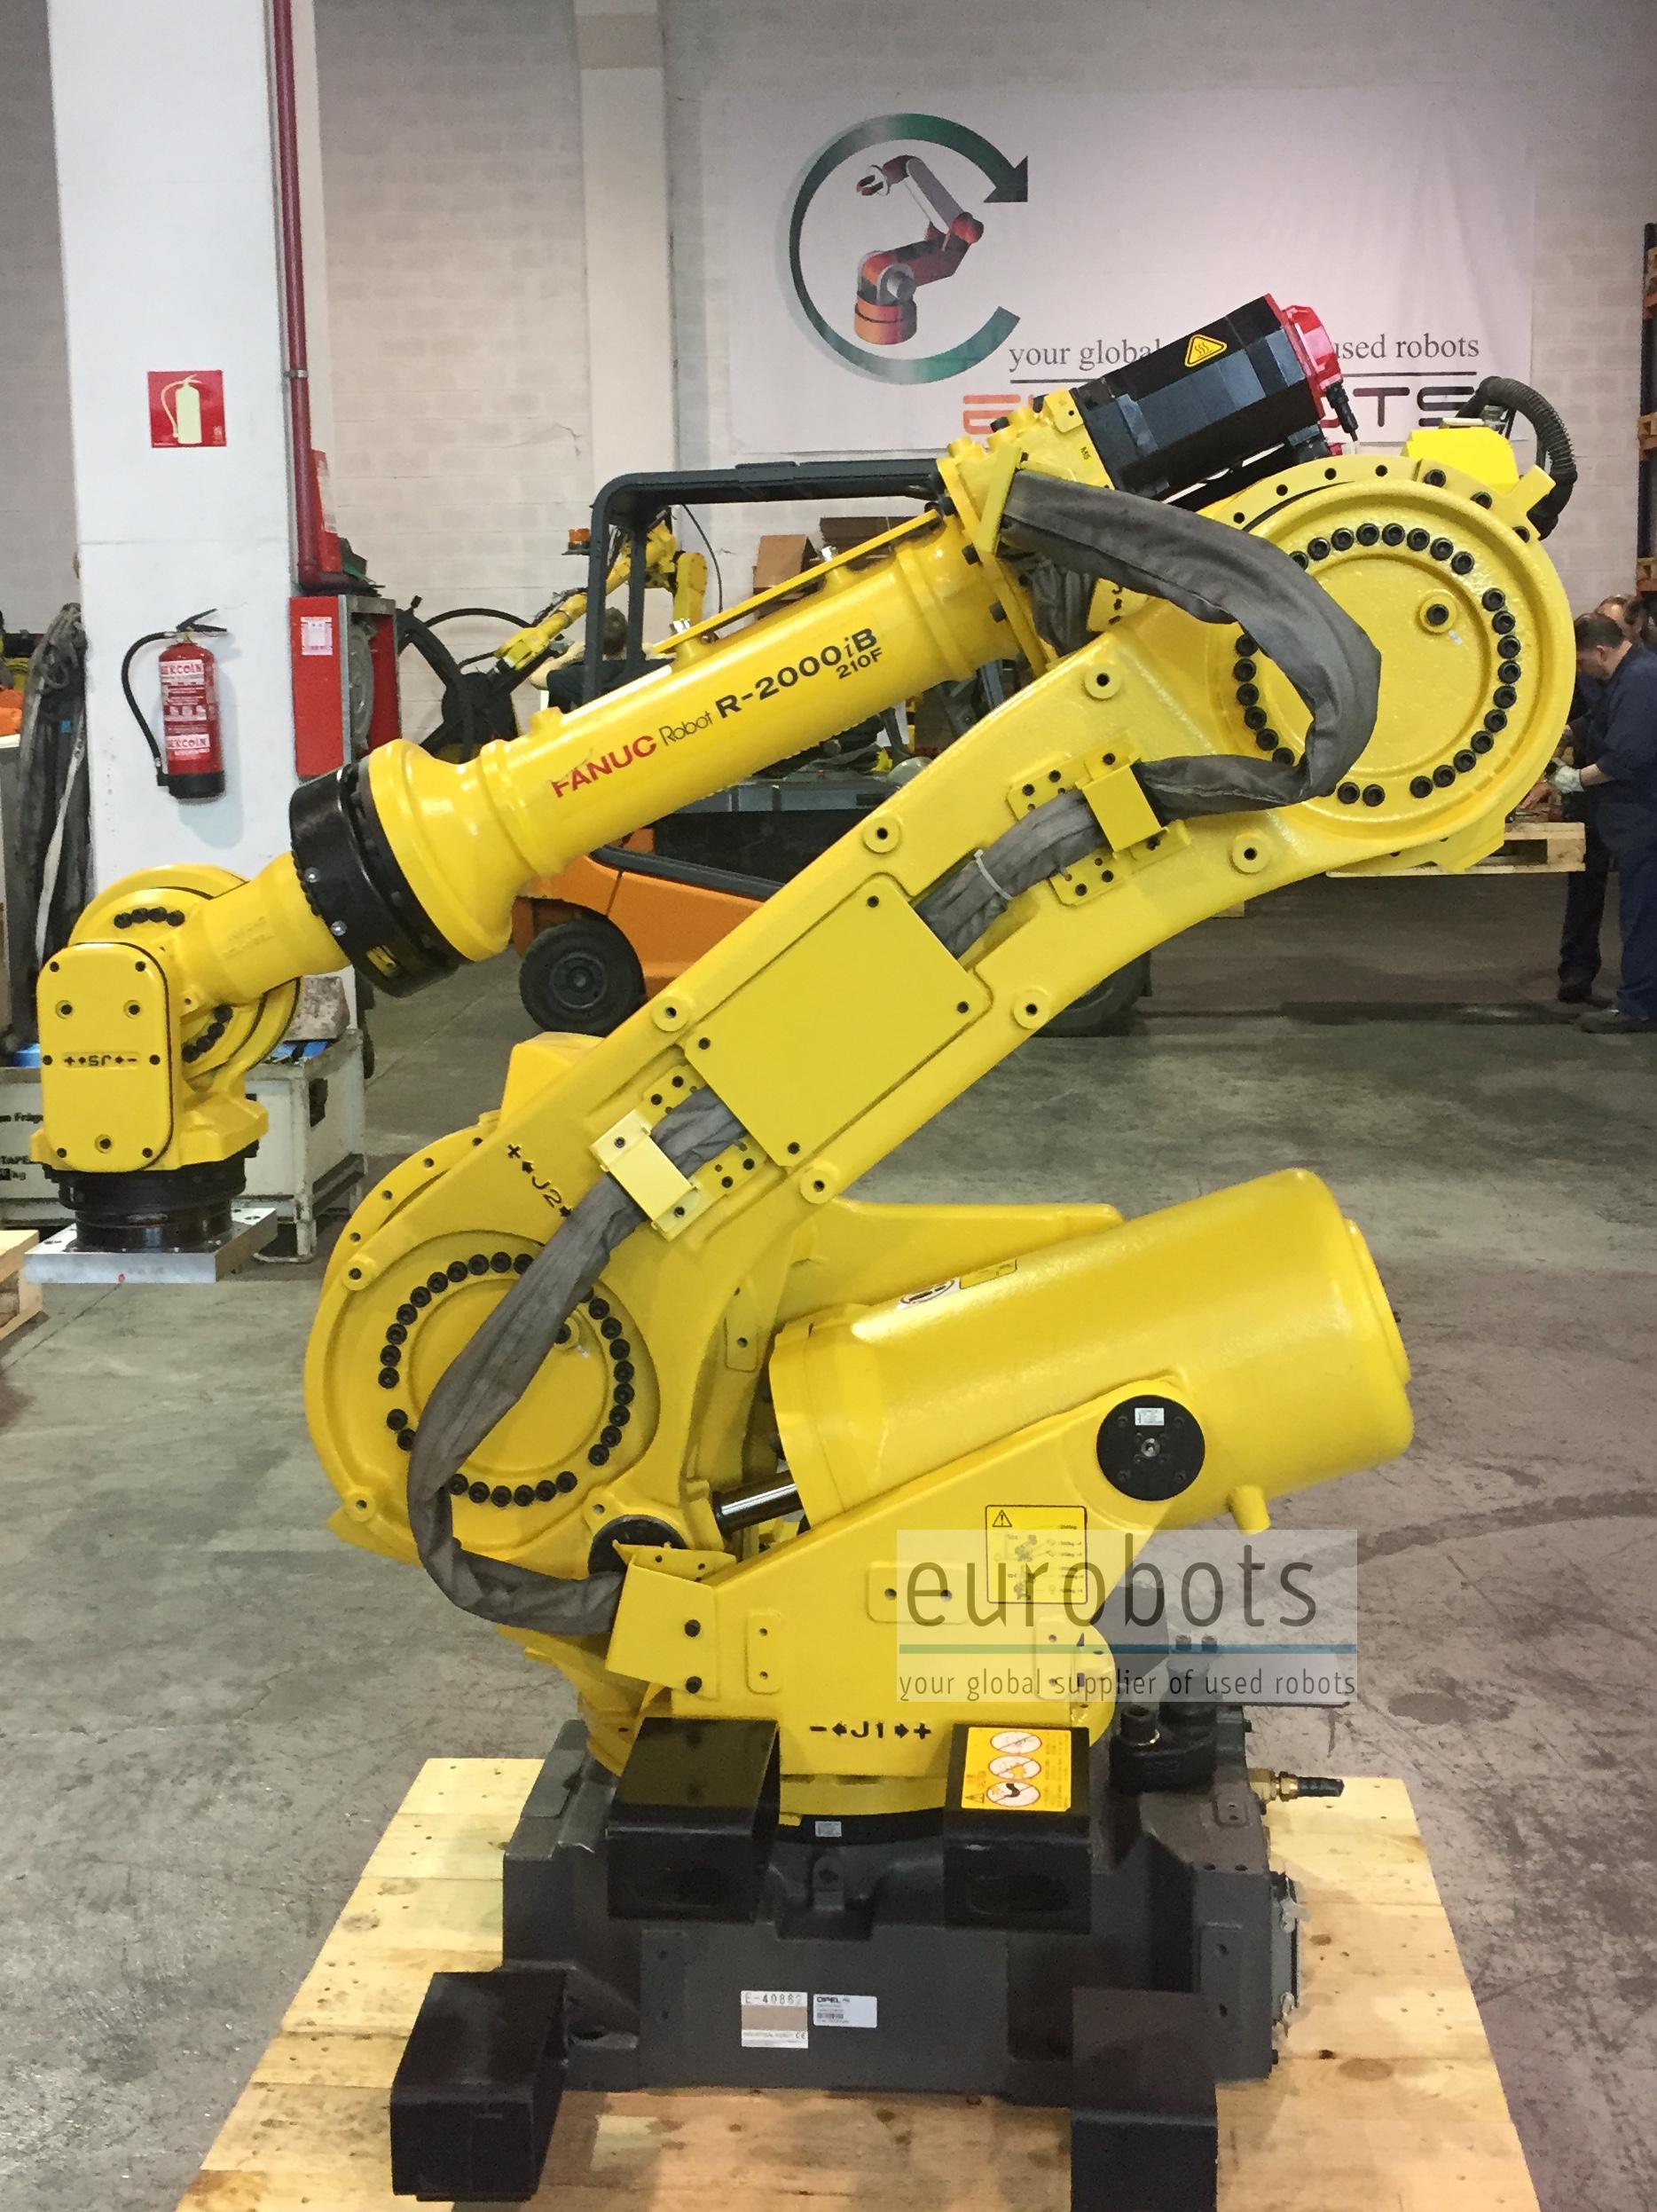 fanuc used r2000ib 210f eurobots kawasaki robot service manual robot kawasaki manual español